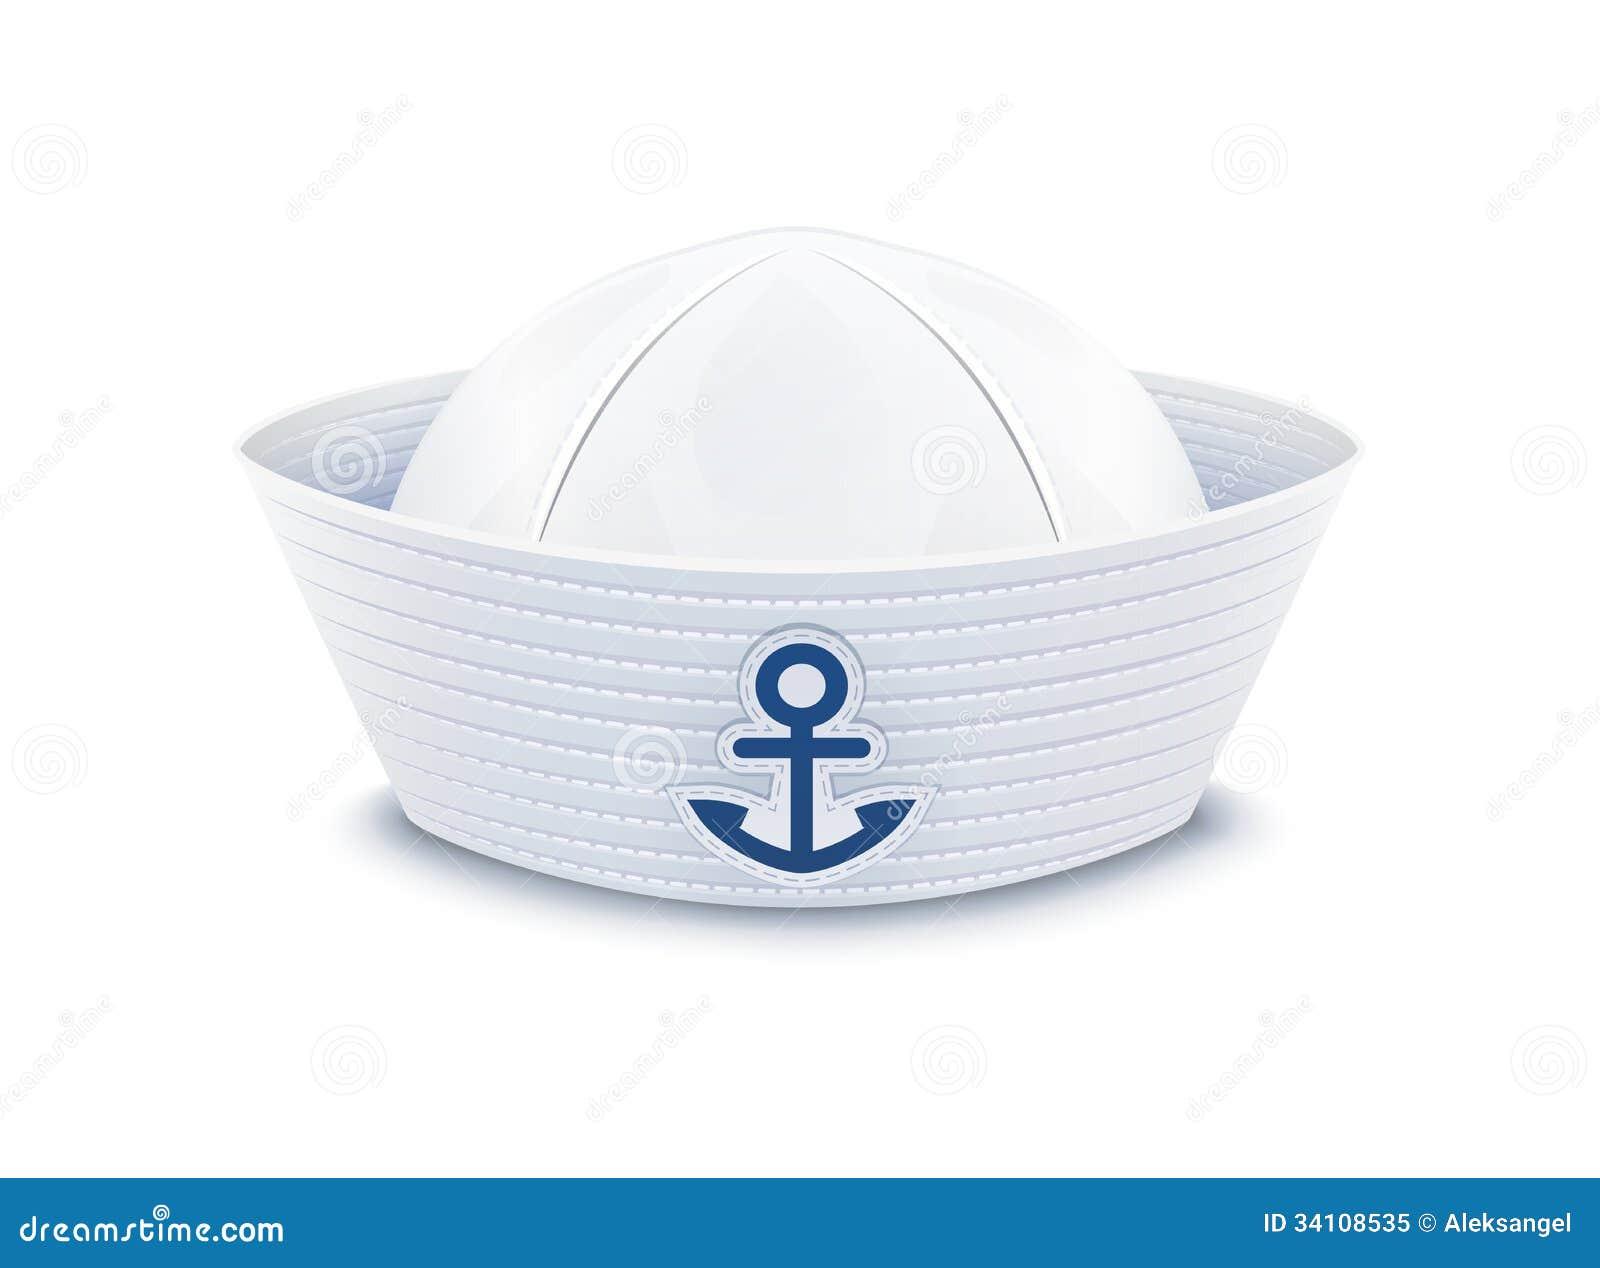 Navy Hat Clipart Sailor cap Royalty Free Stock